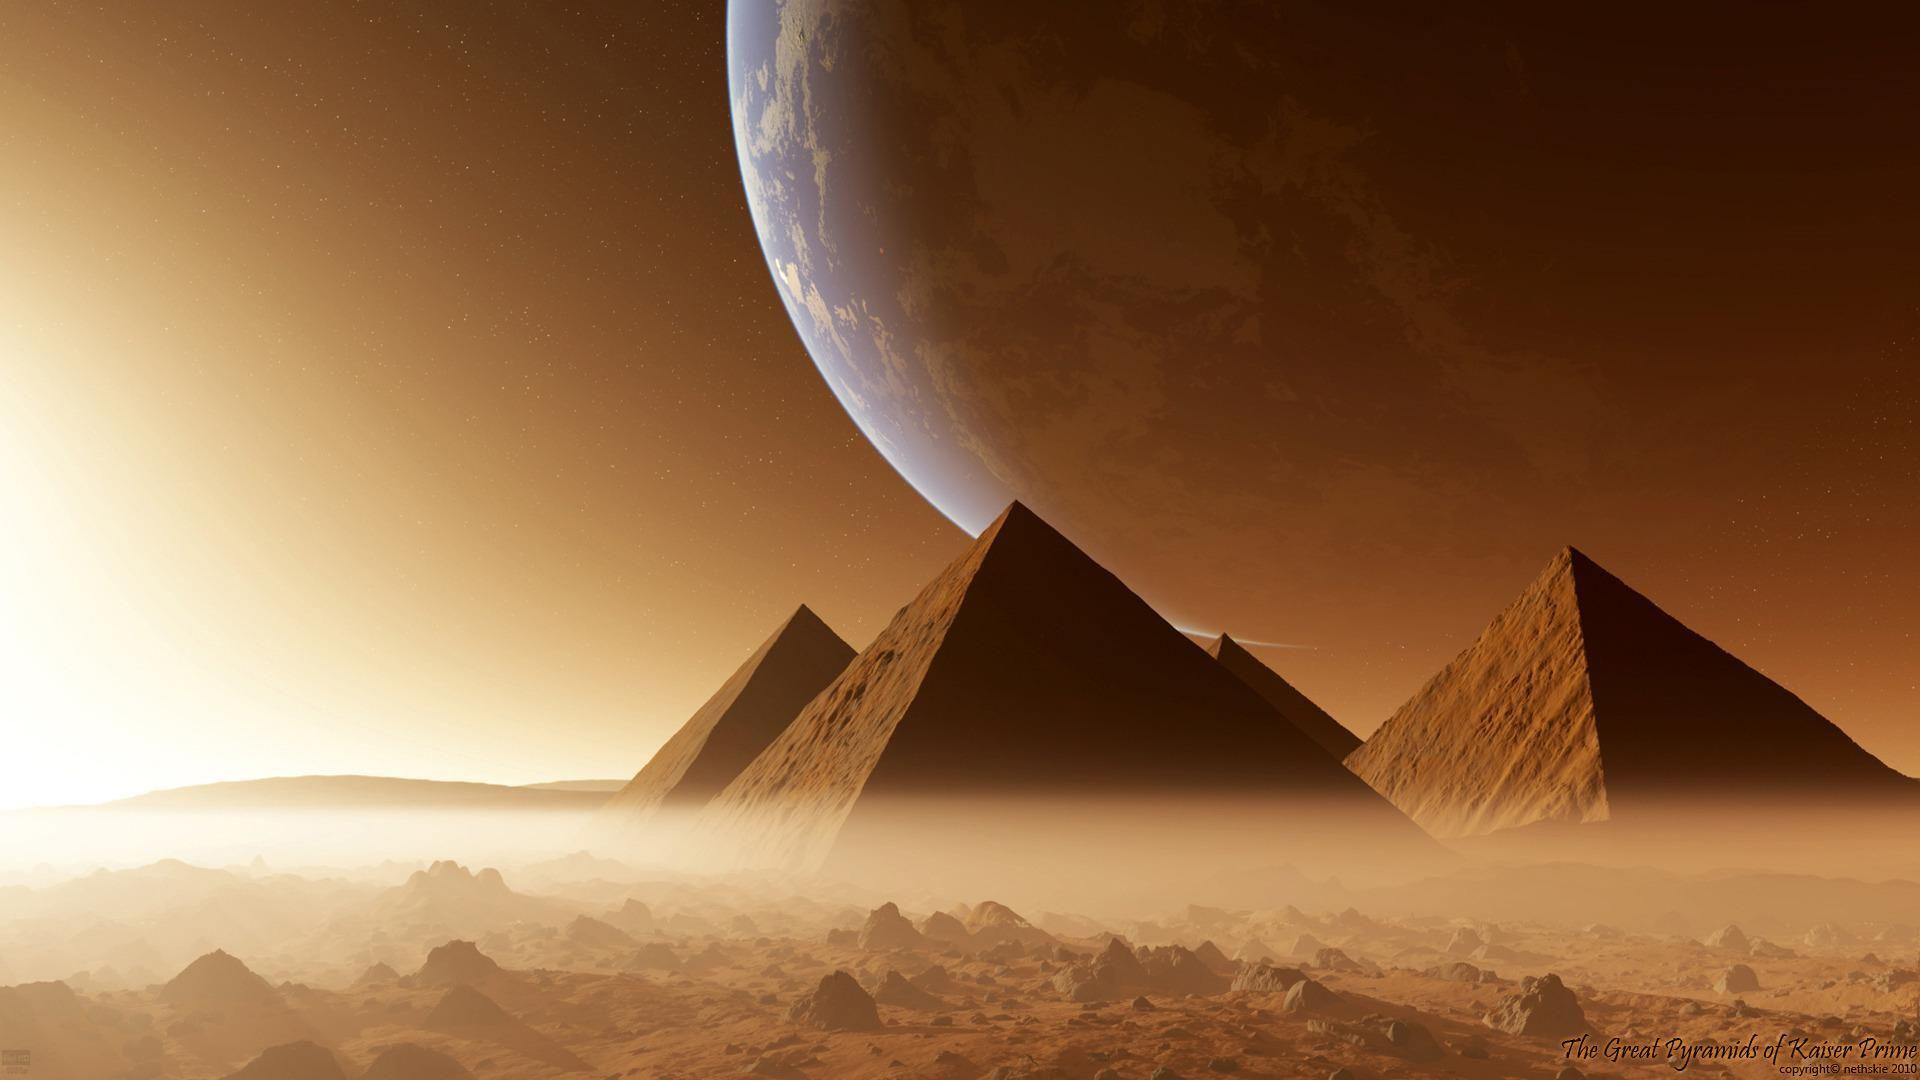 Pramid Hd Wallpaper Favimwalls Egypt Wallpaper Pyramids Desktop Background Images